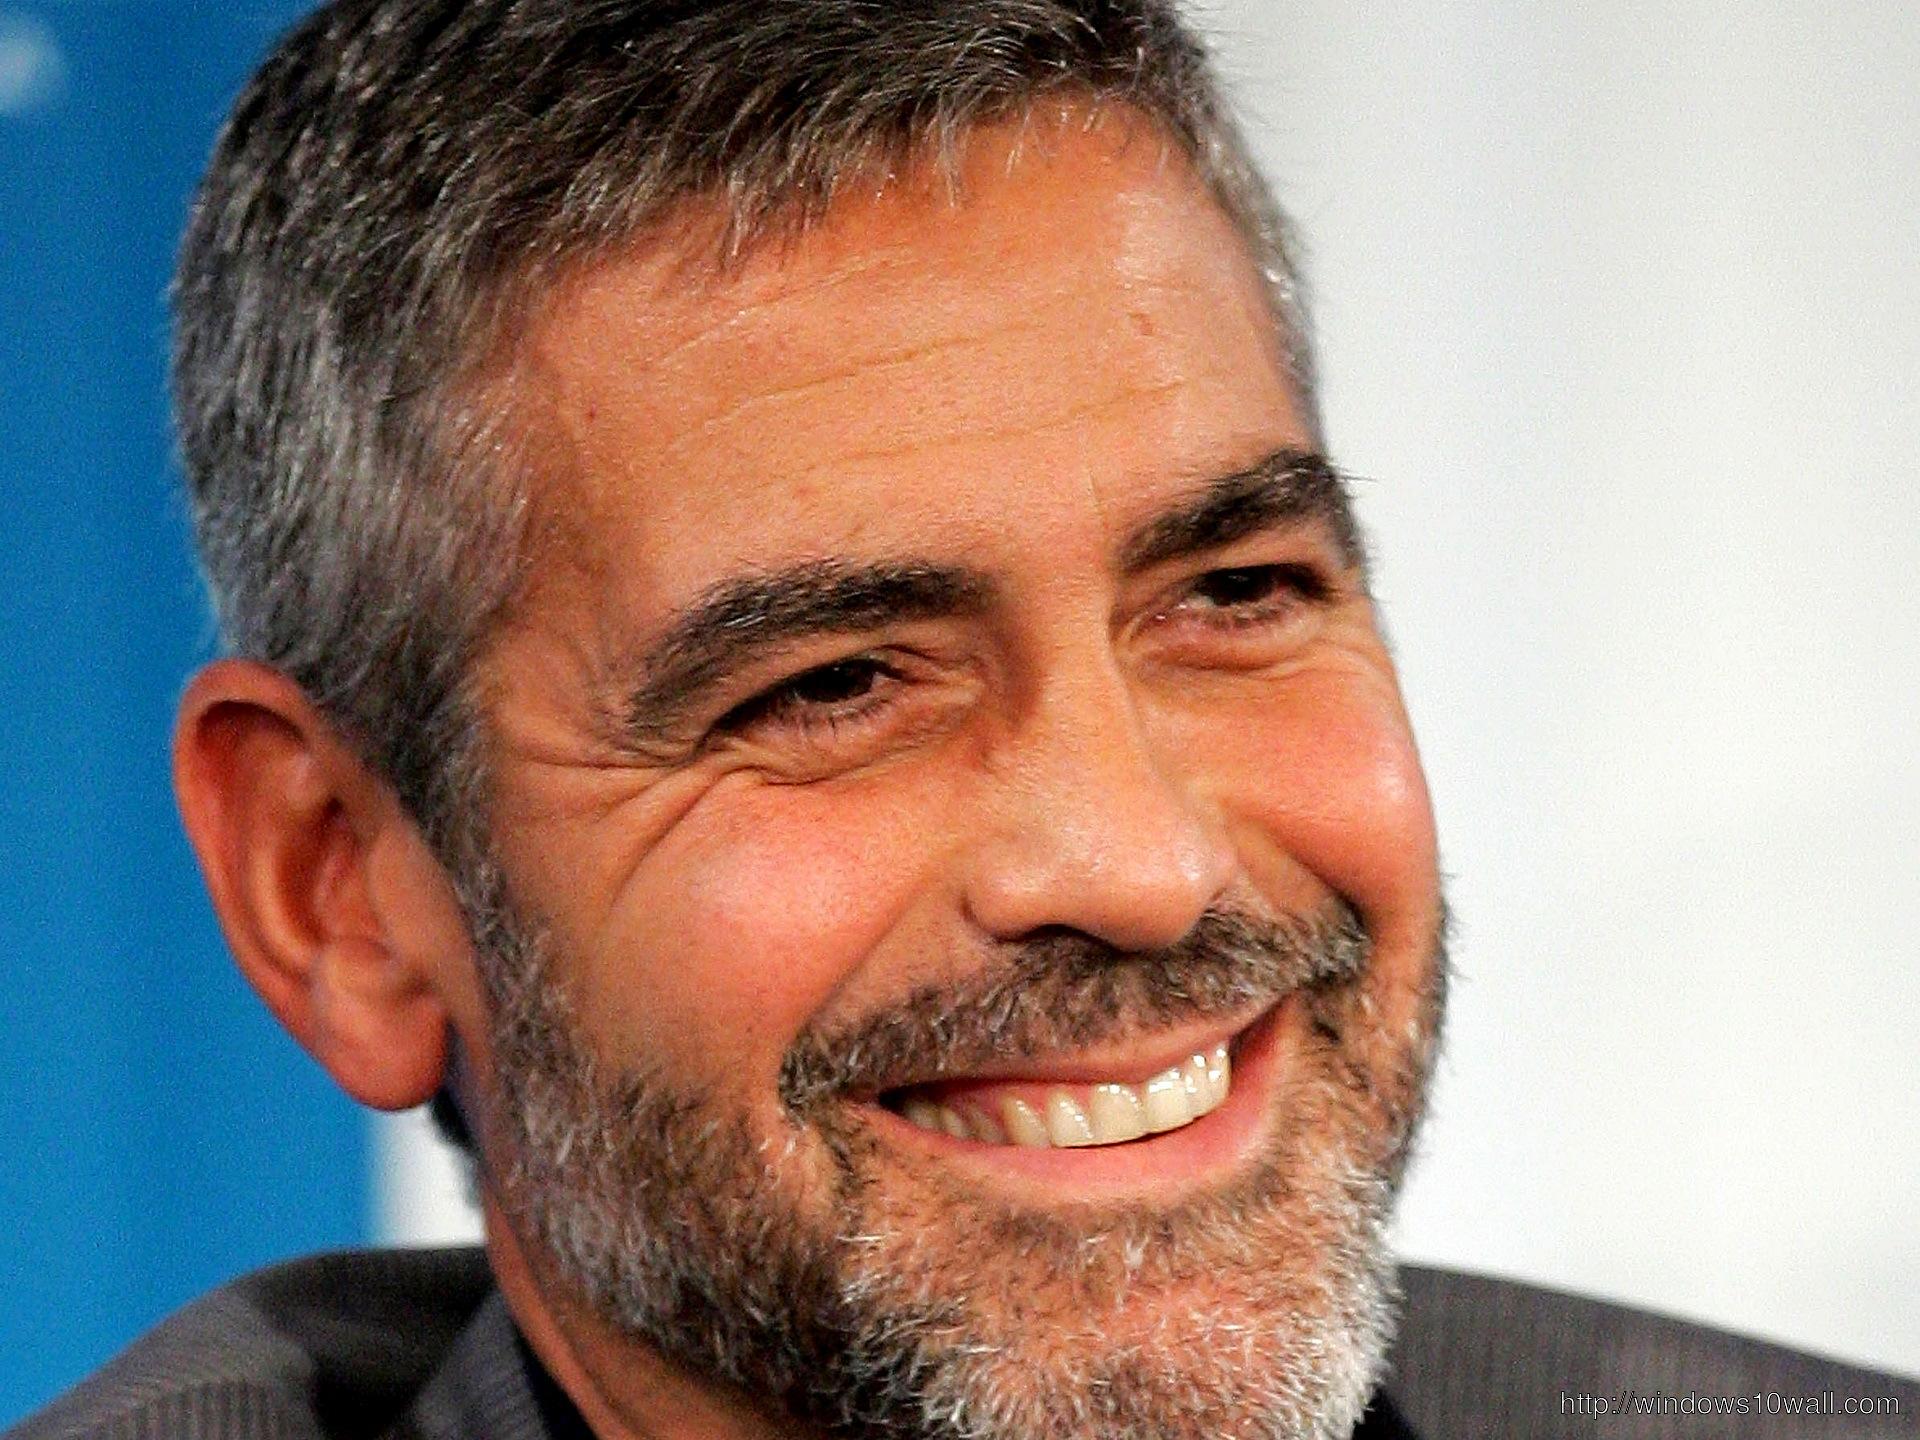 George Clooney Smile wallpaper 1920x1440